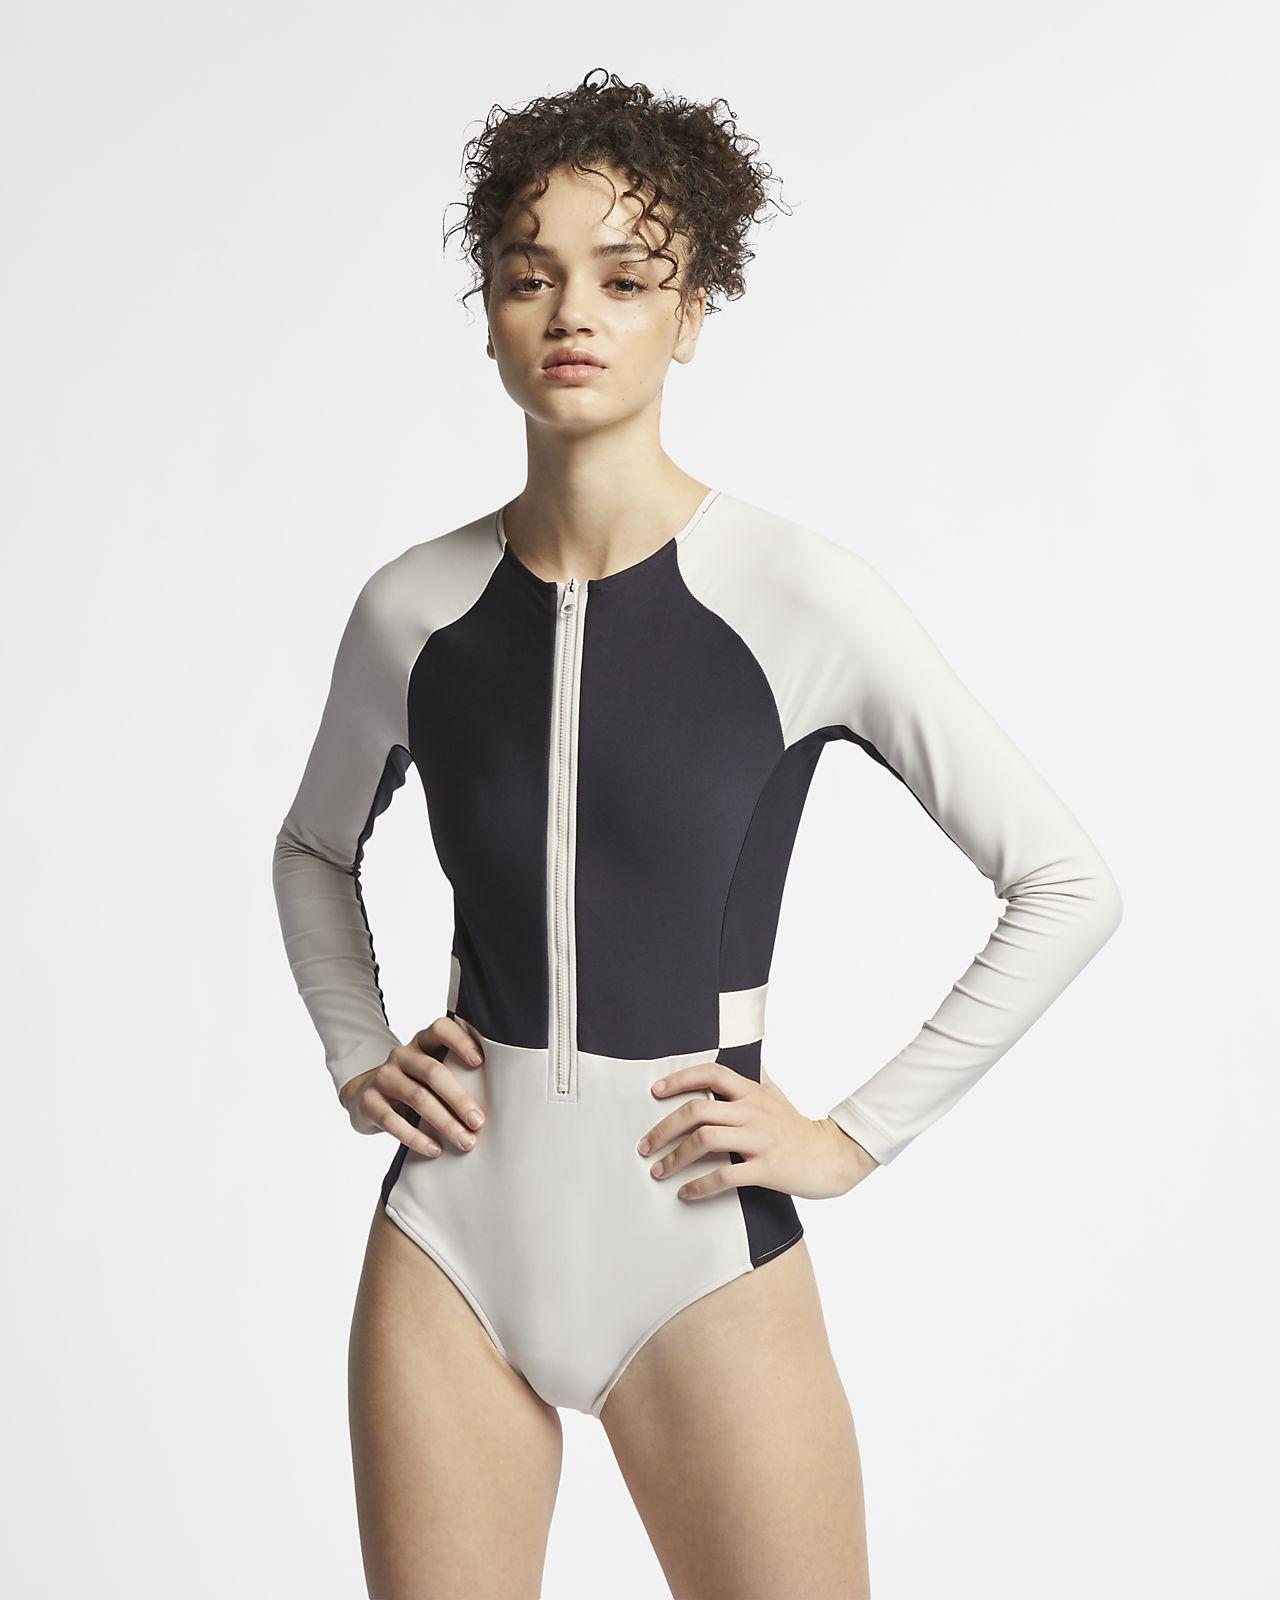 e3021a02ed6 Hurley Quick Dry Ballet Women s Long-Sleeve Surf Suit. Nike.com